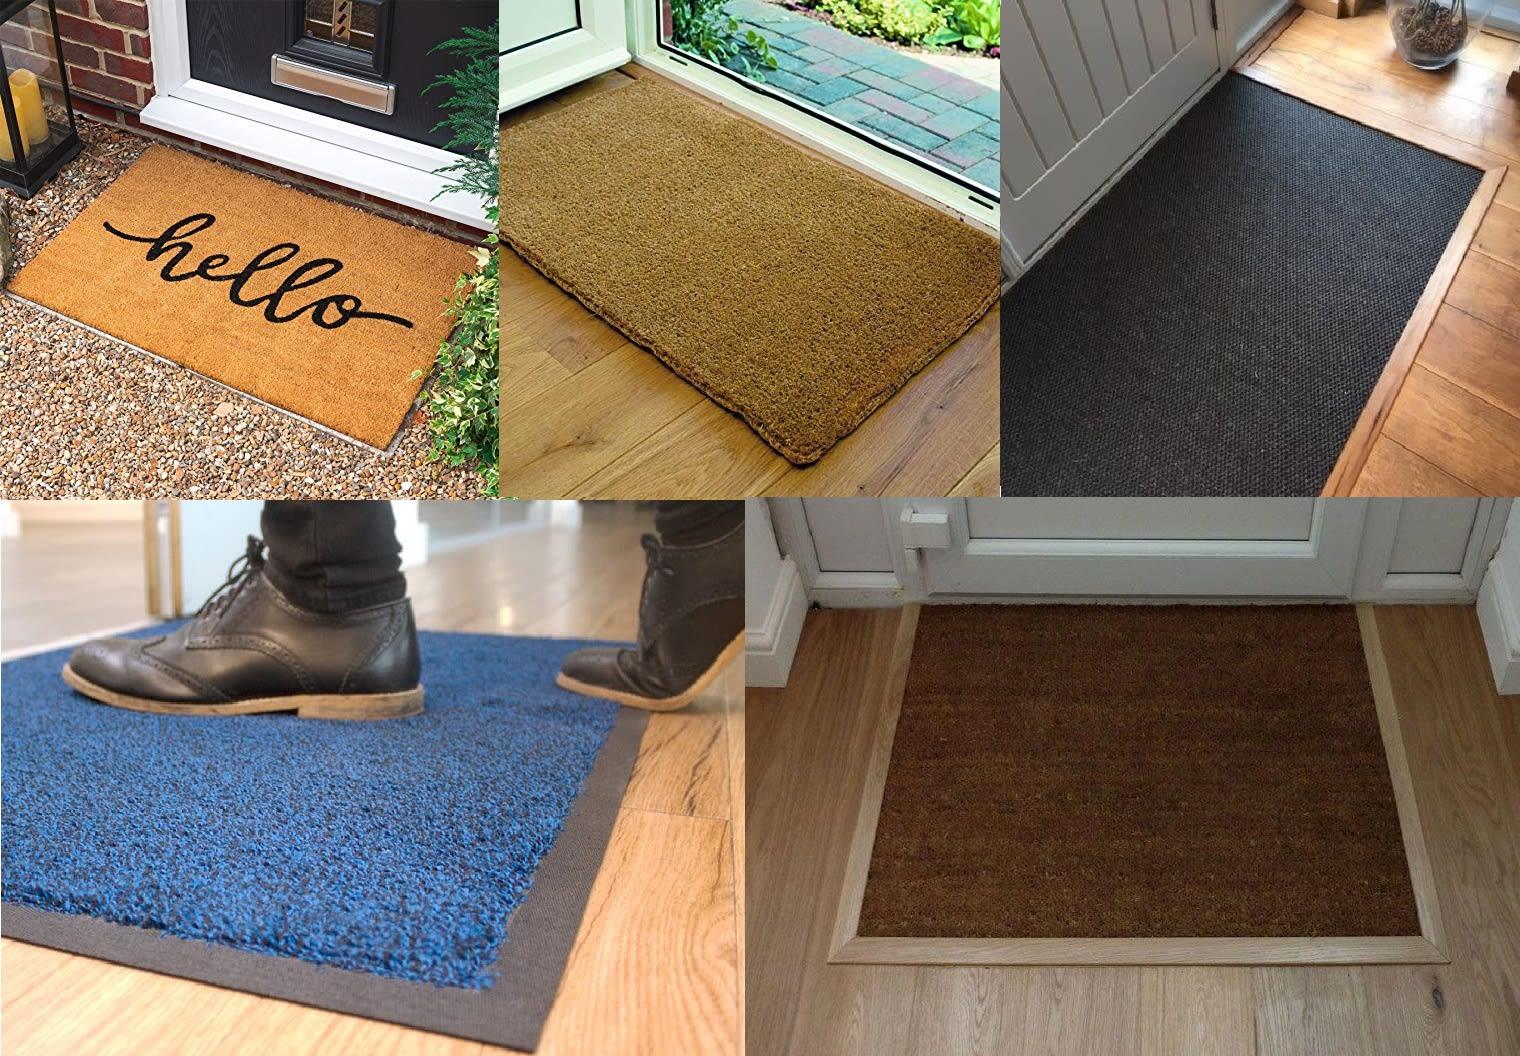 Protecting Hardwood Floors